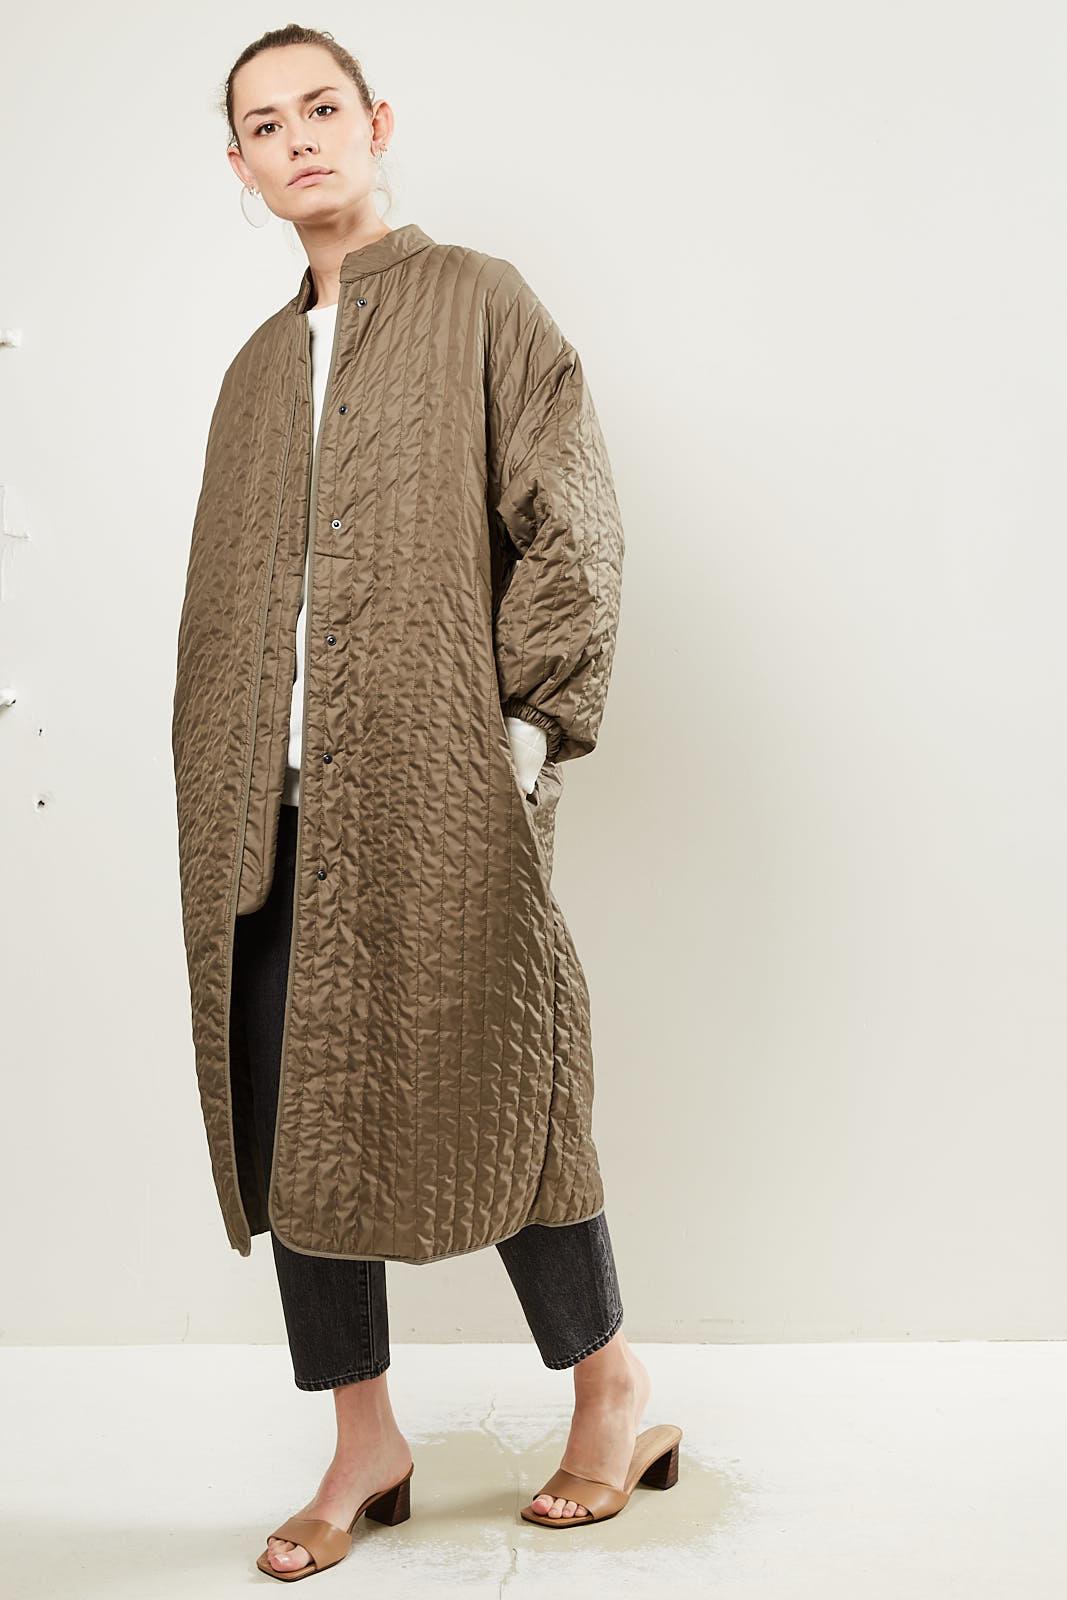 Humanoid Carli collins coat